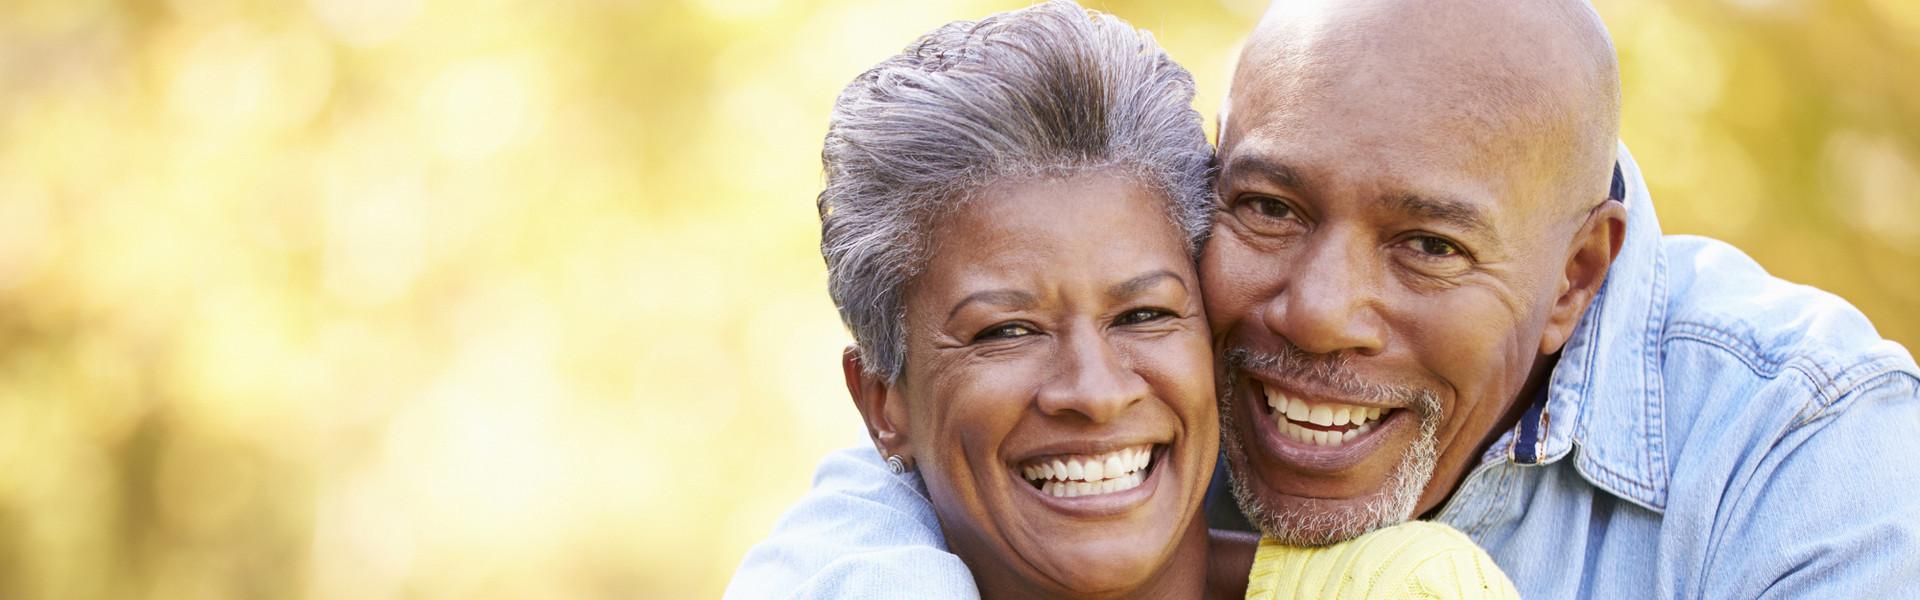 Senior Citizen Discounts | Westgate Blue Tree Resort | Hotel Senior Discounts in Florida Near Sea World Area, Orlando, FL 32836